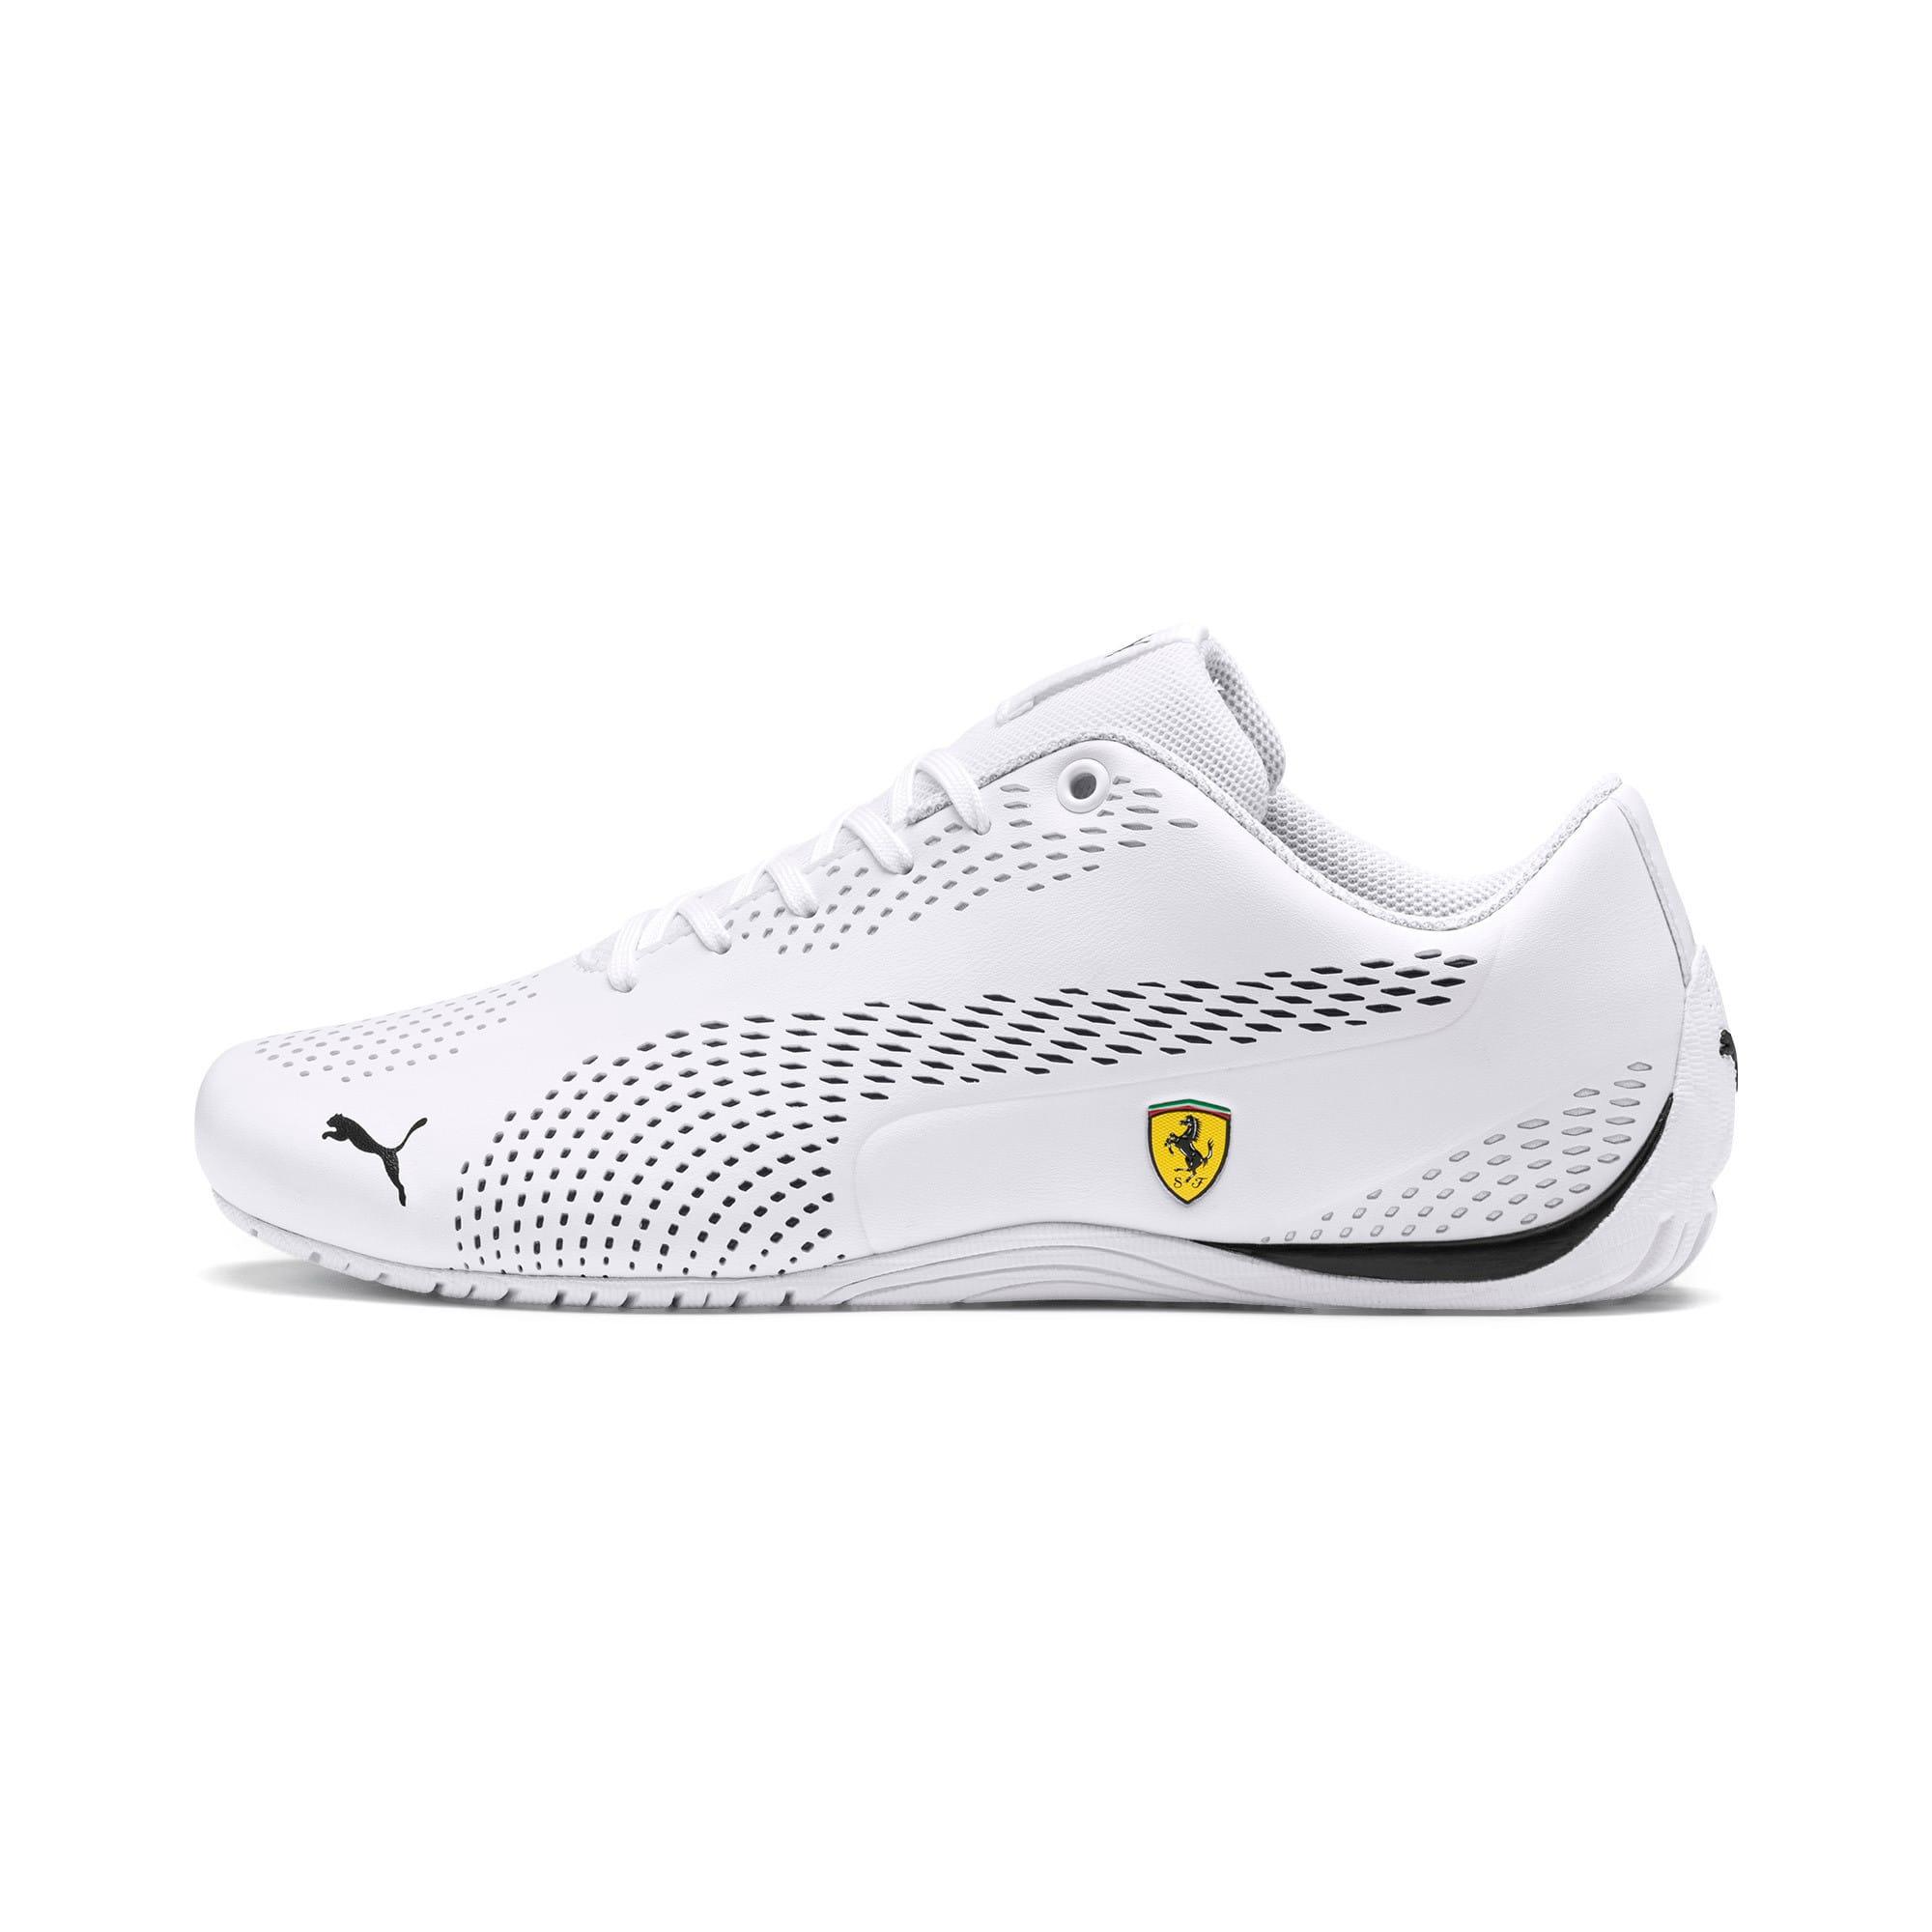 Thumbnail 1 of Ferrari Drift Cat 5 Ultra II sneakers, Puma White-Puma Black, medium